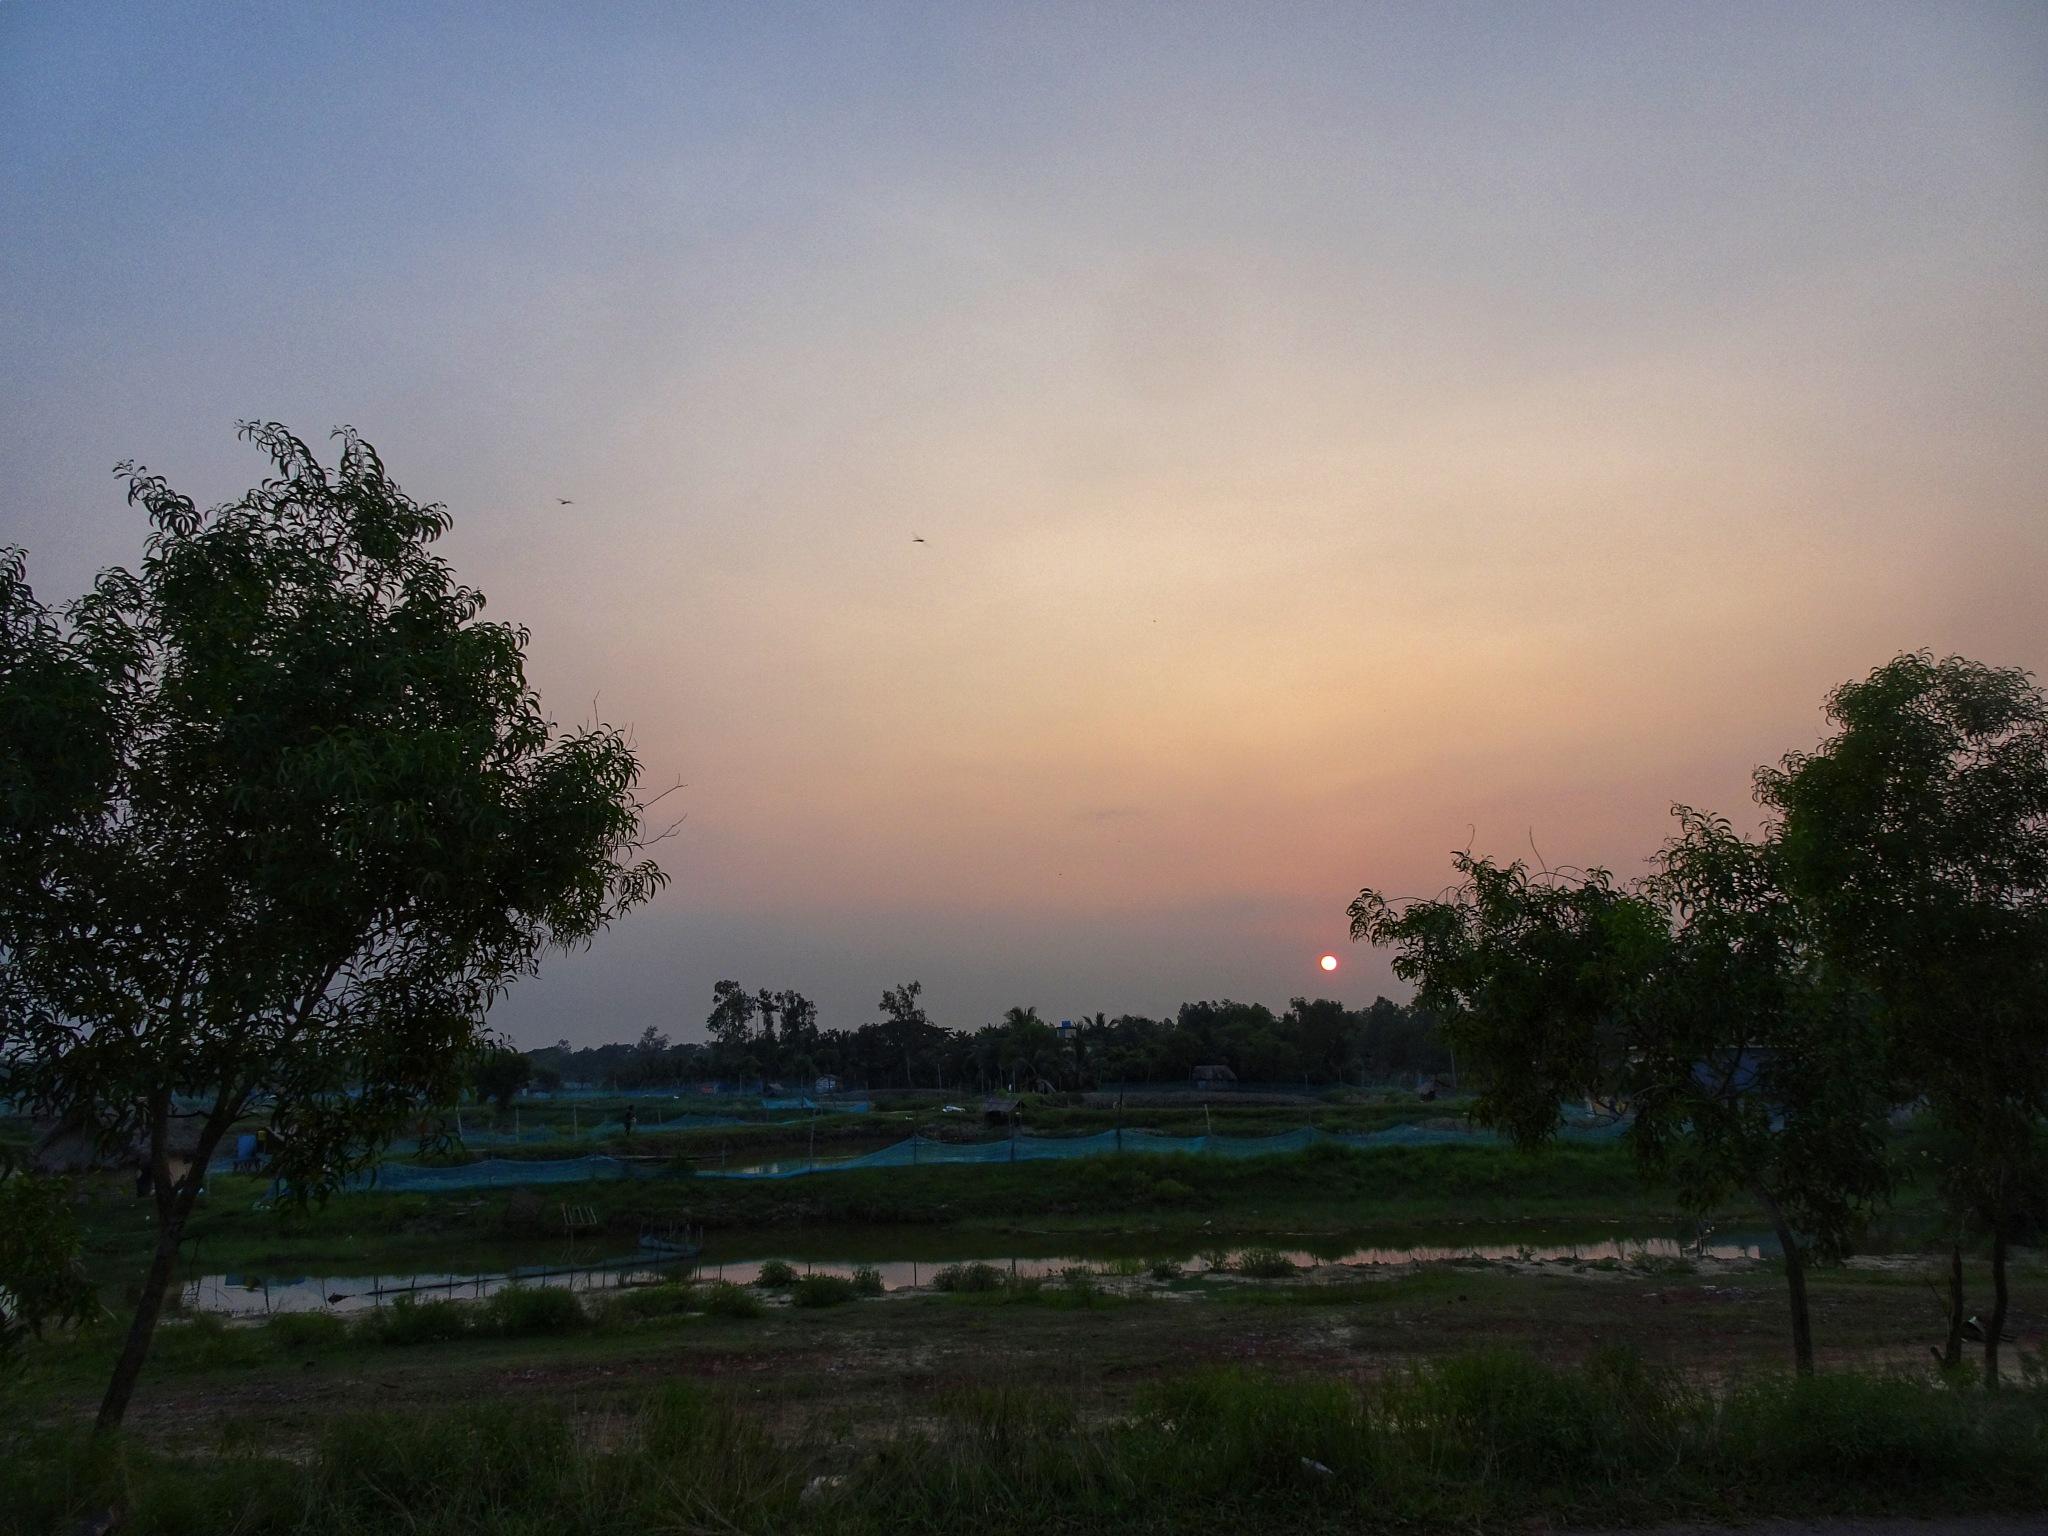 settings sun by soumitra maity